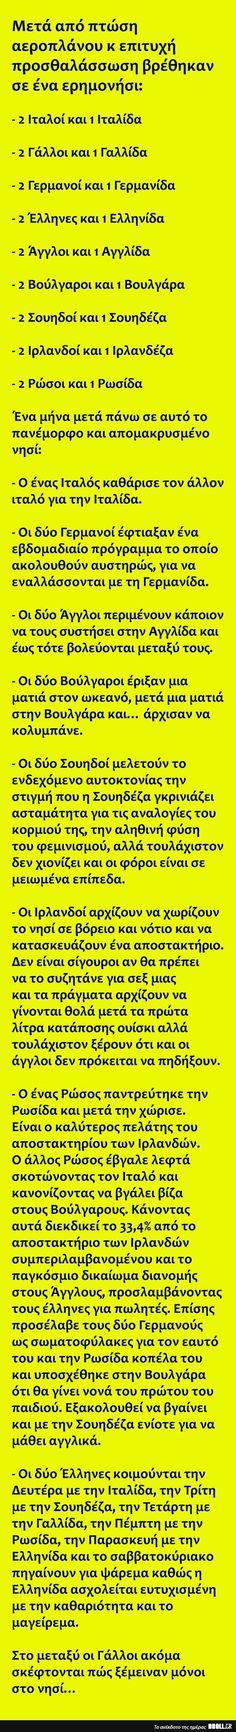 DROLL.gr - Ανέκδοτα, αστείες εικόνες και αστεία βίντεο Funny Memes, Jokes, My Images, Greek, Lol, Cartoon, Humor, Tips, Animals